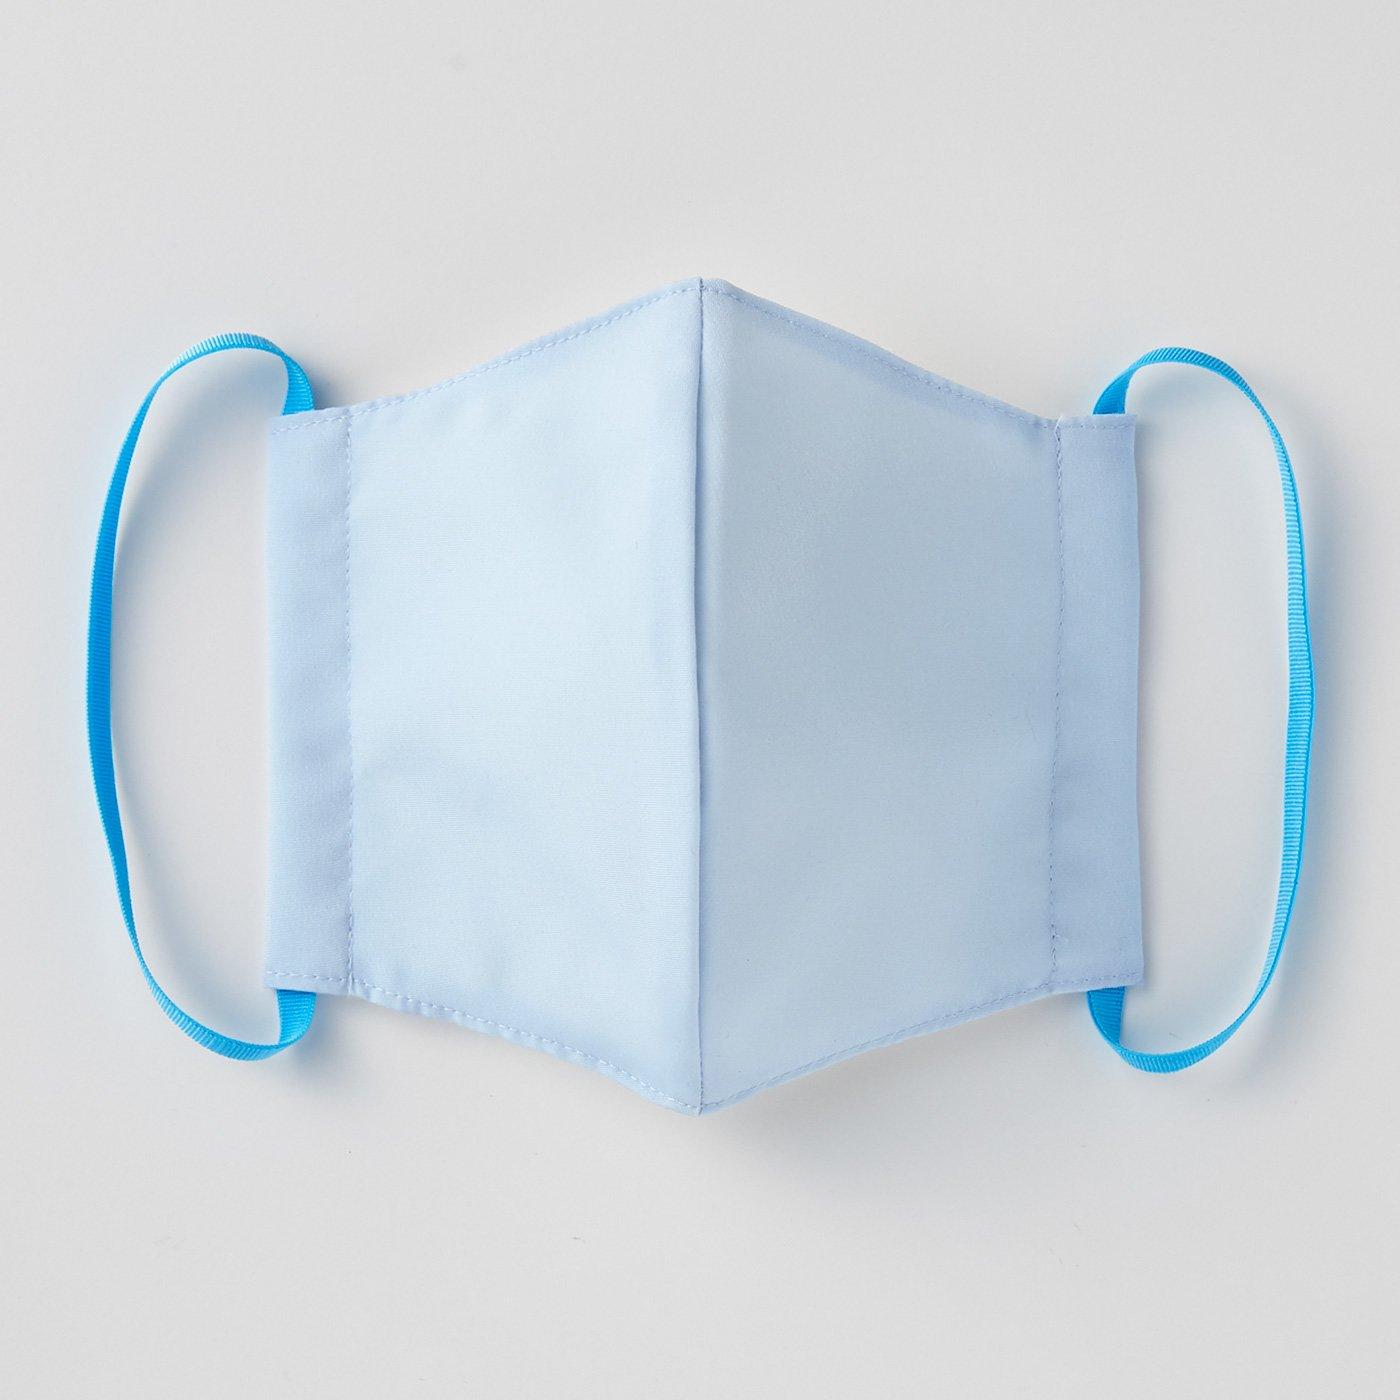 OSYAIRO UVカットのキレイカラーマスク〈ブルー〉